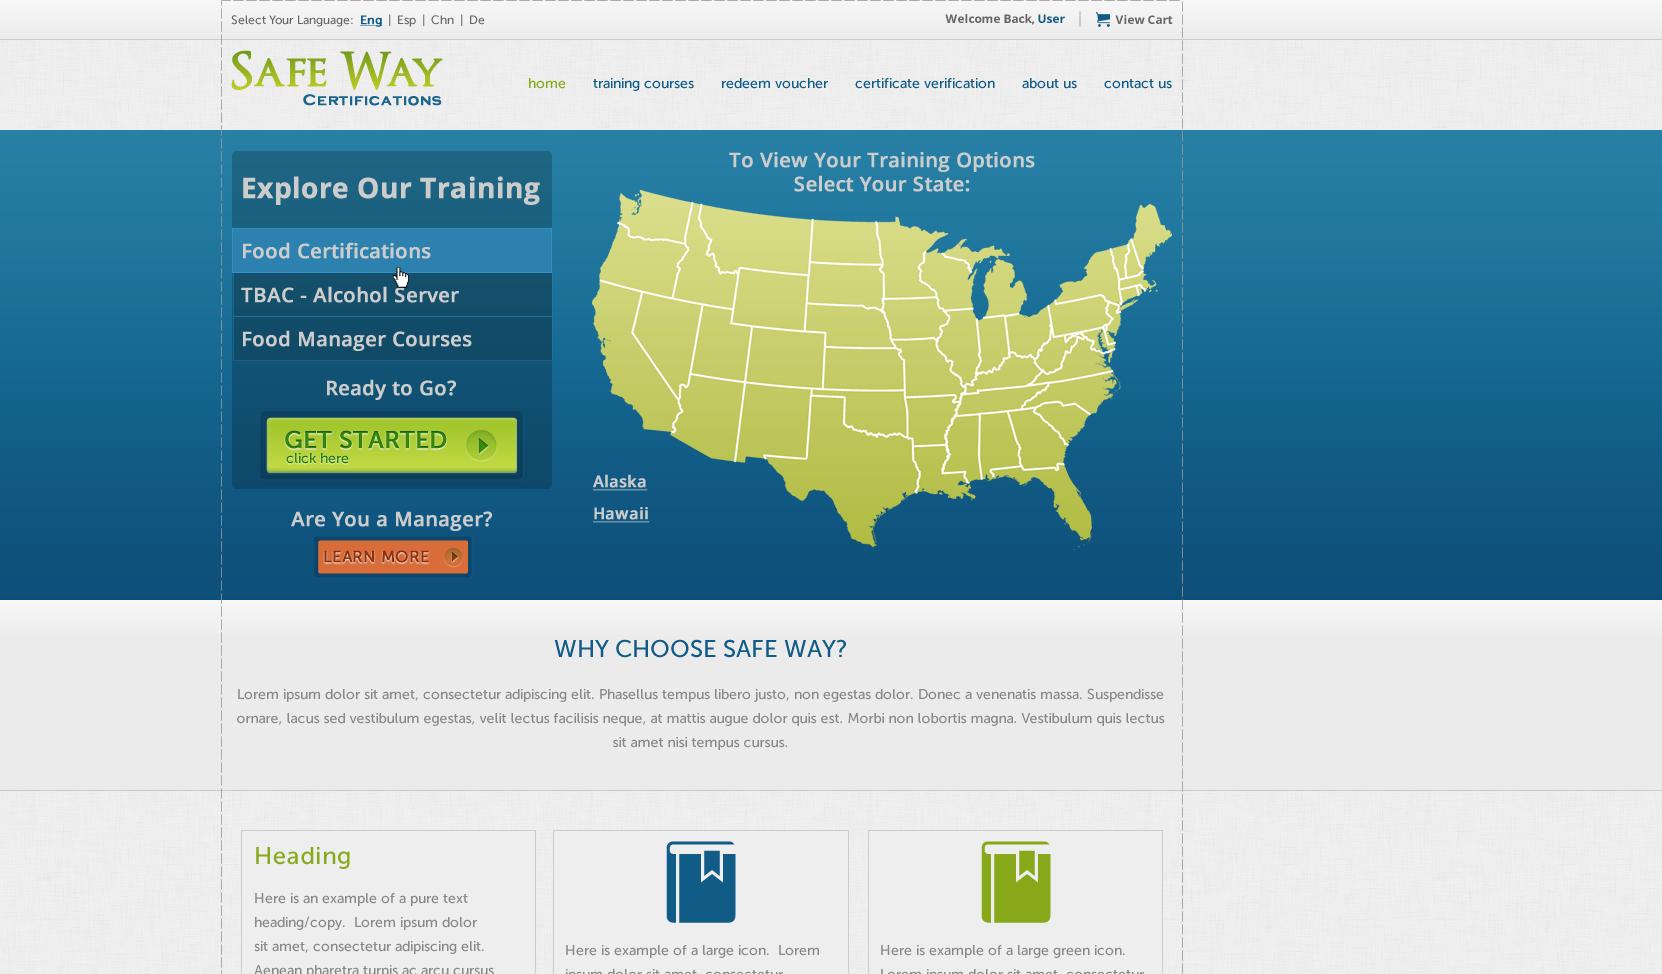 Website Visual Design for Professional Training Company